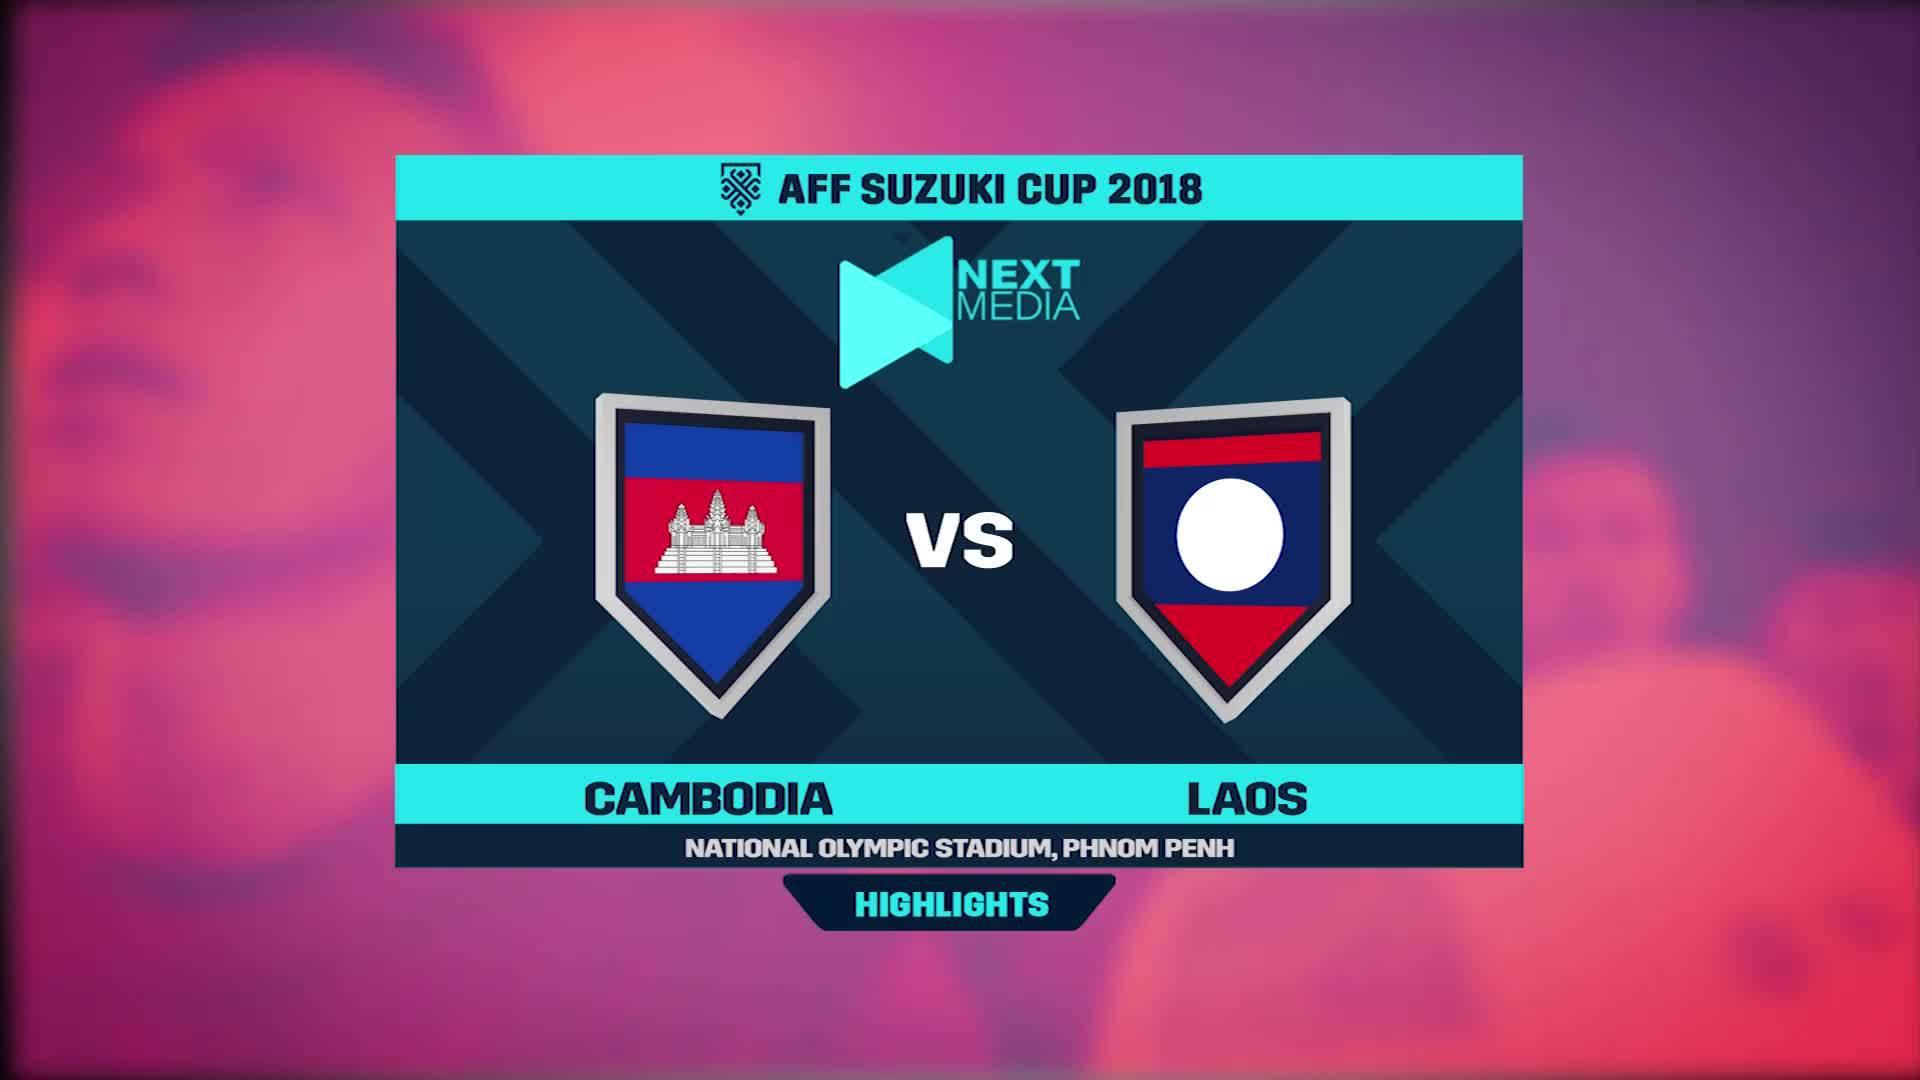 Campuchia 3-1 Lào